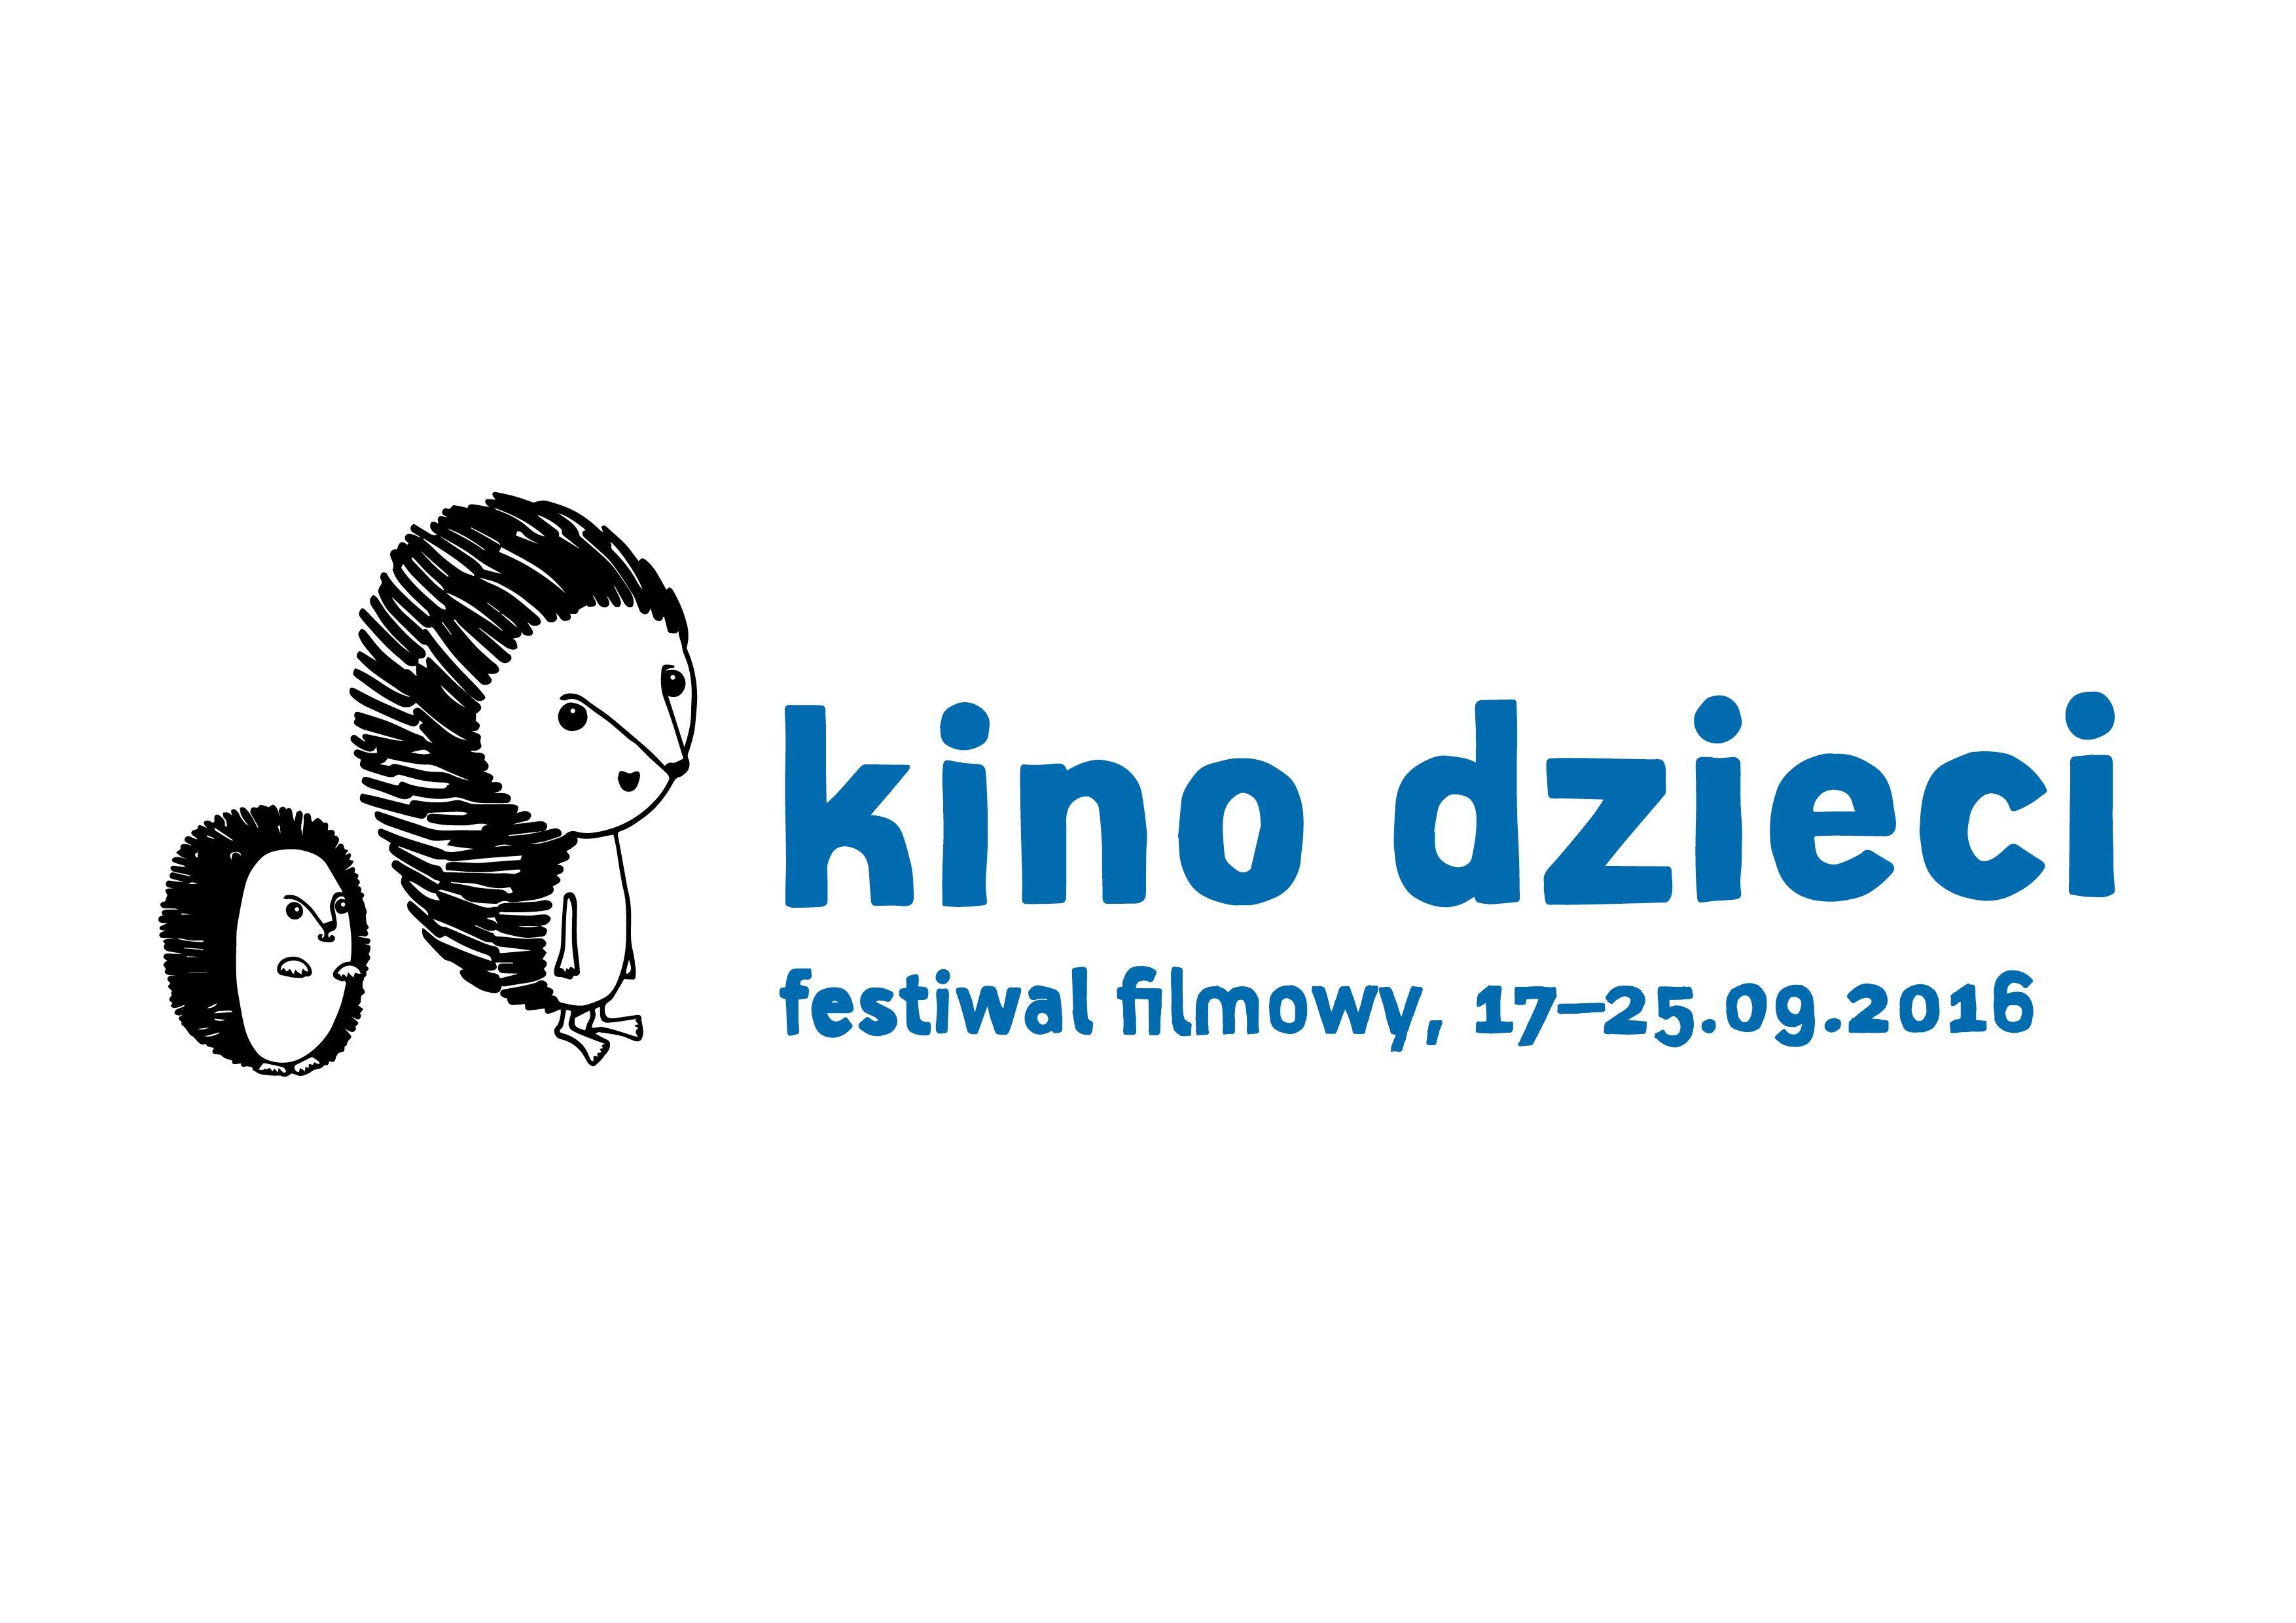 Kino Dzieci logo